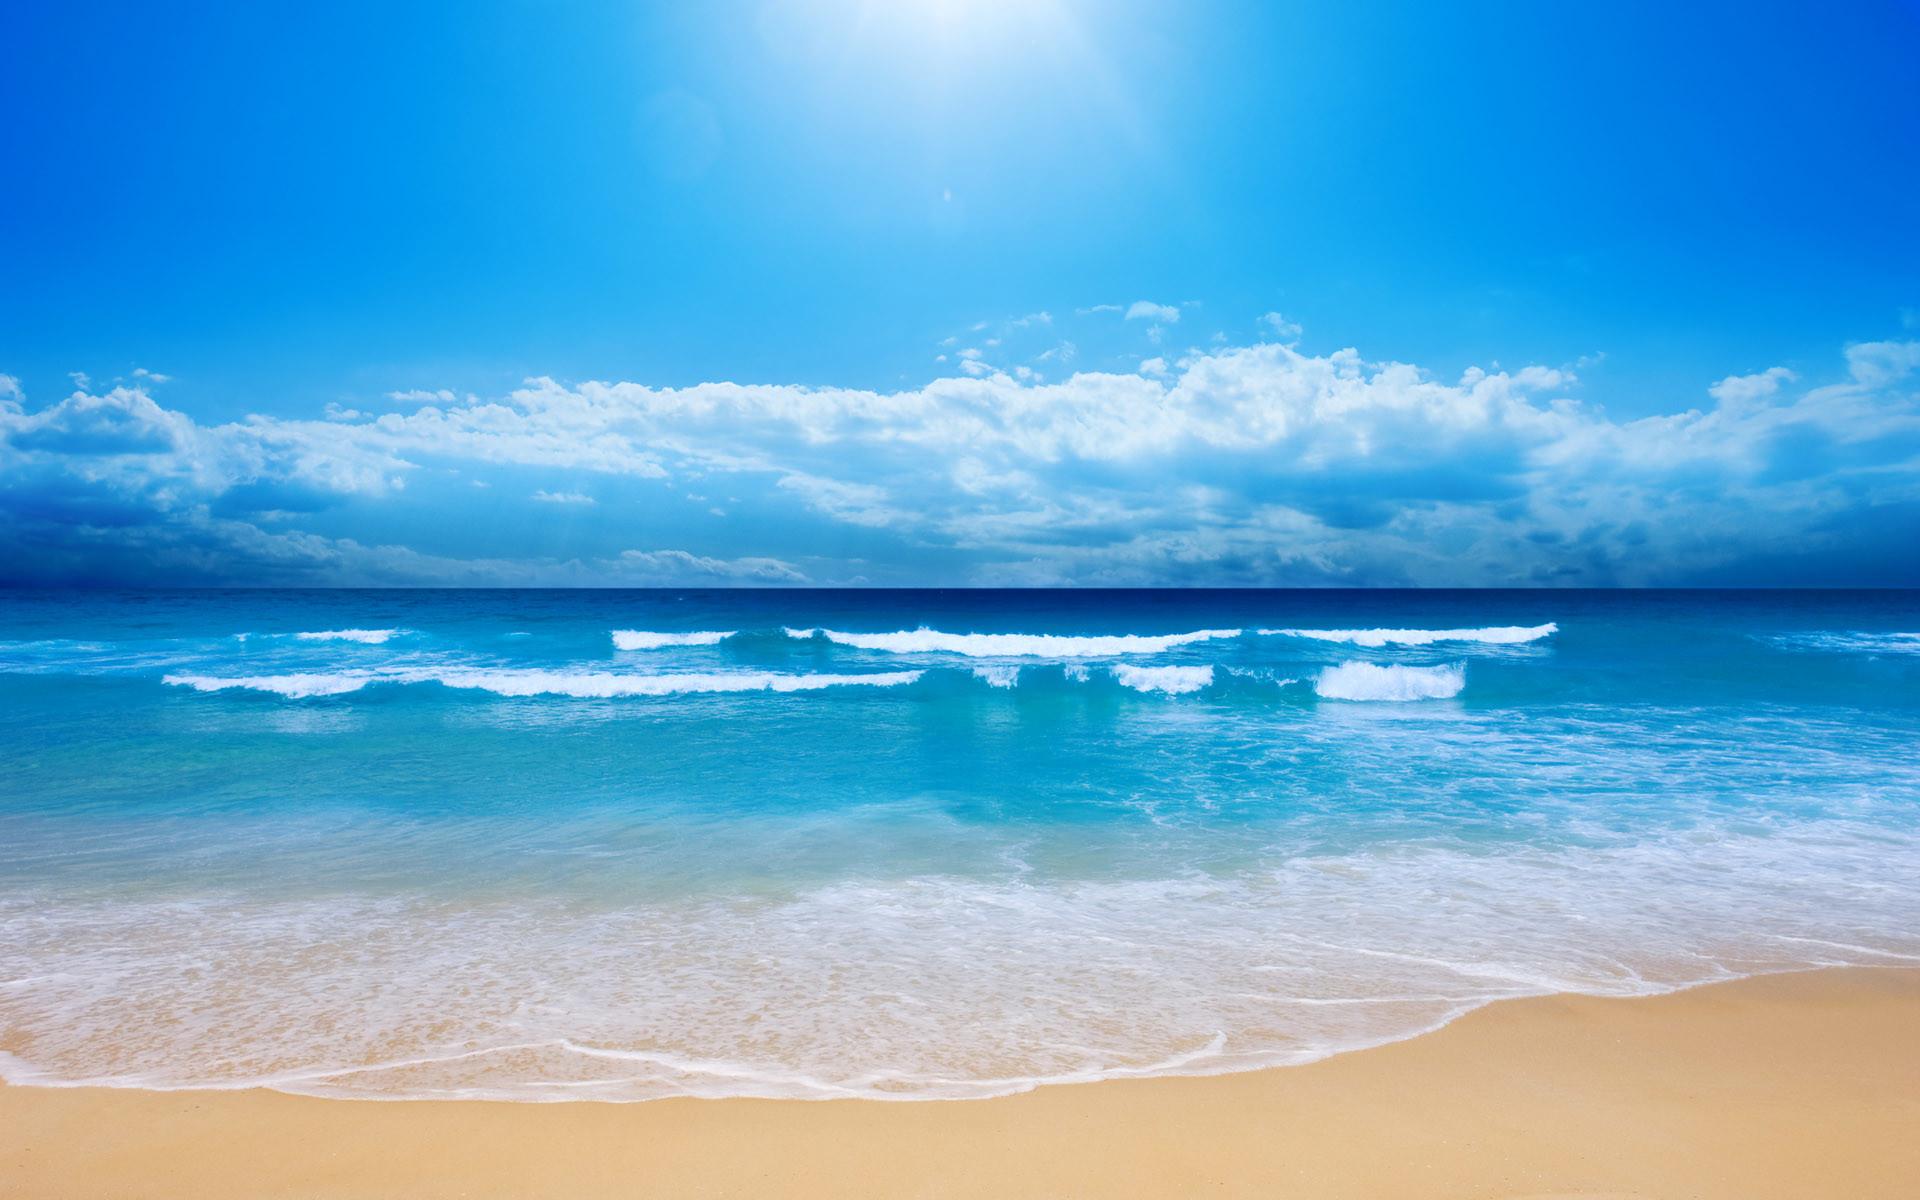 Holiday Beach – Wallpaper #11151